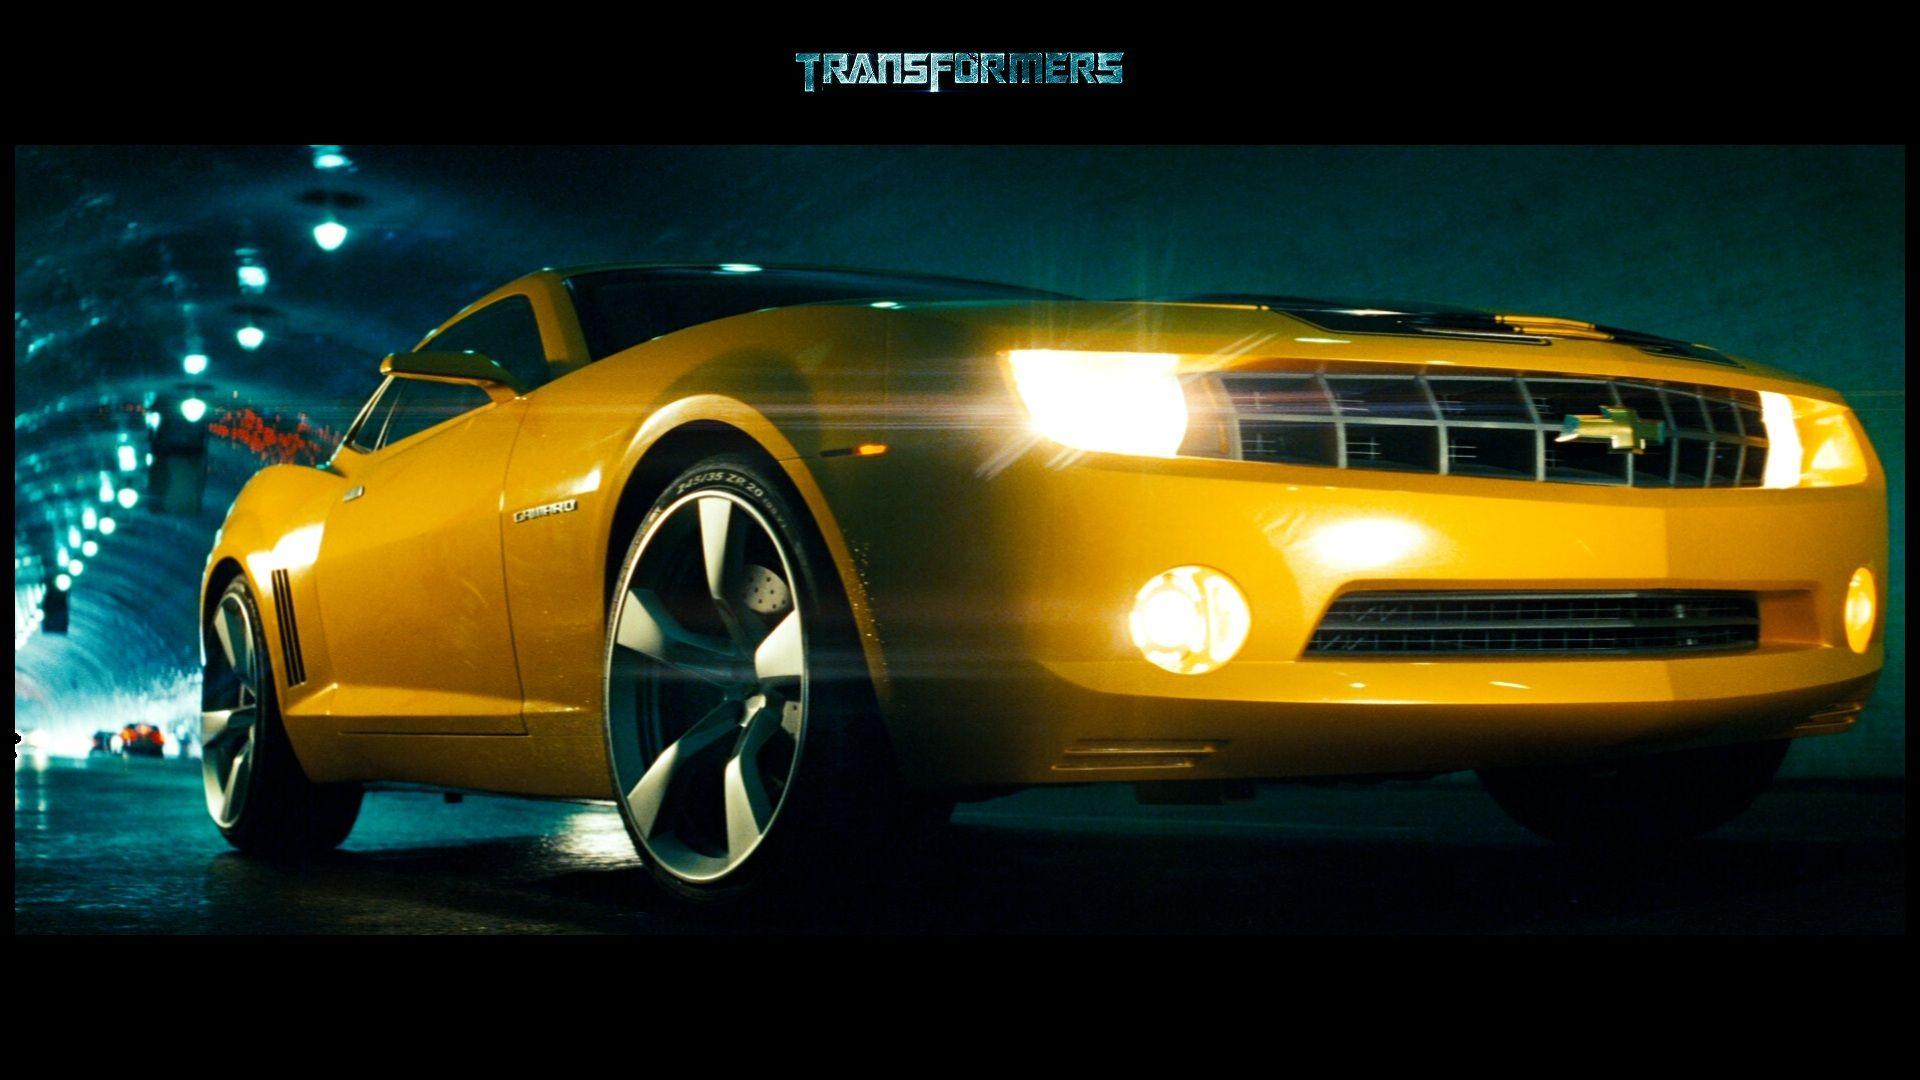 transformers , bumblebee , camaro download (2880x1800) Transformers Bumblebee Wallpapers Group 78